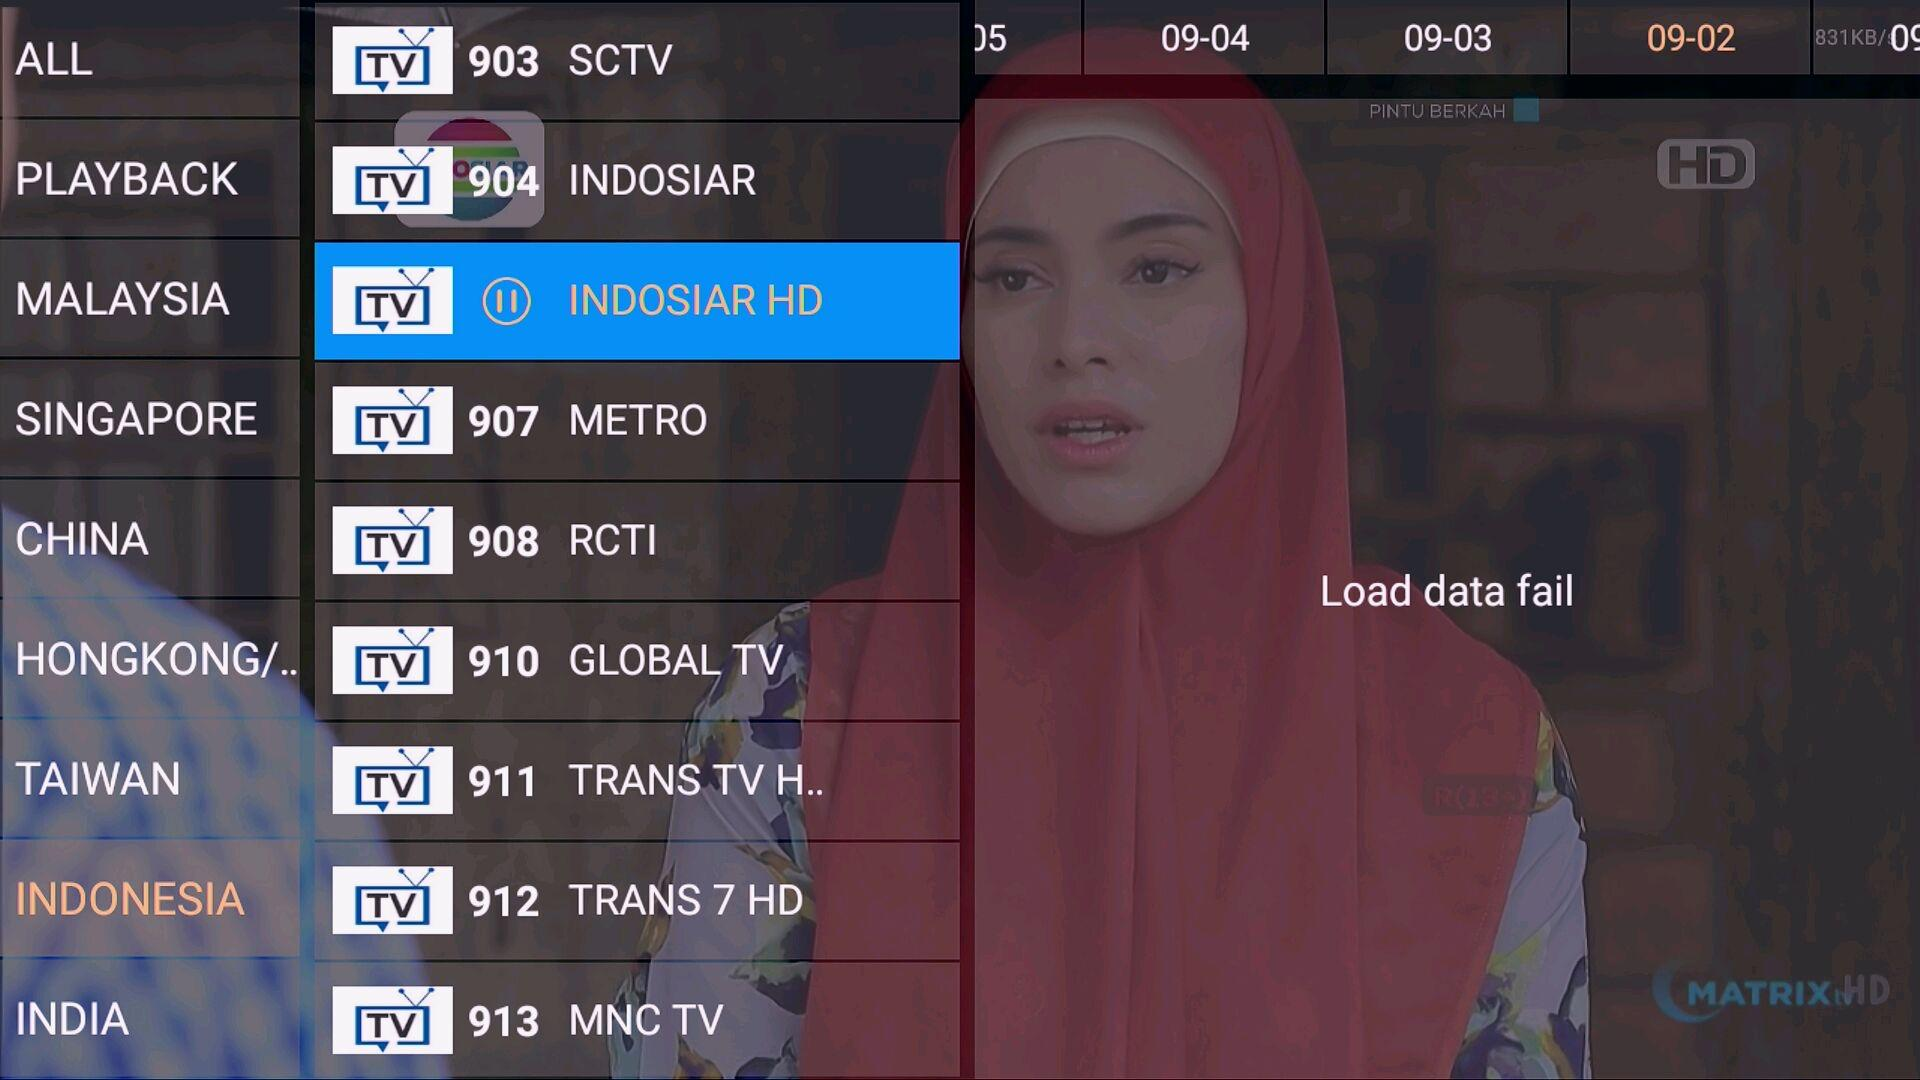 2020 latest Singapore Malaysia tv box iFibre Cloud all Starhub tv channels astro 10